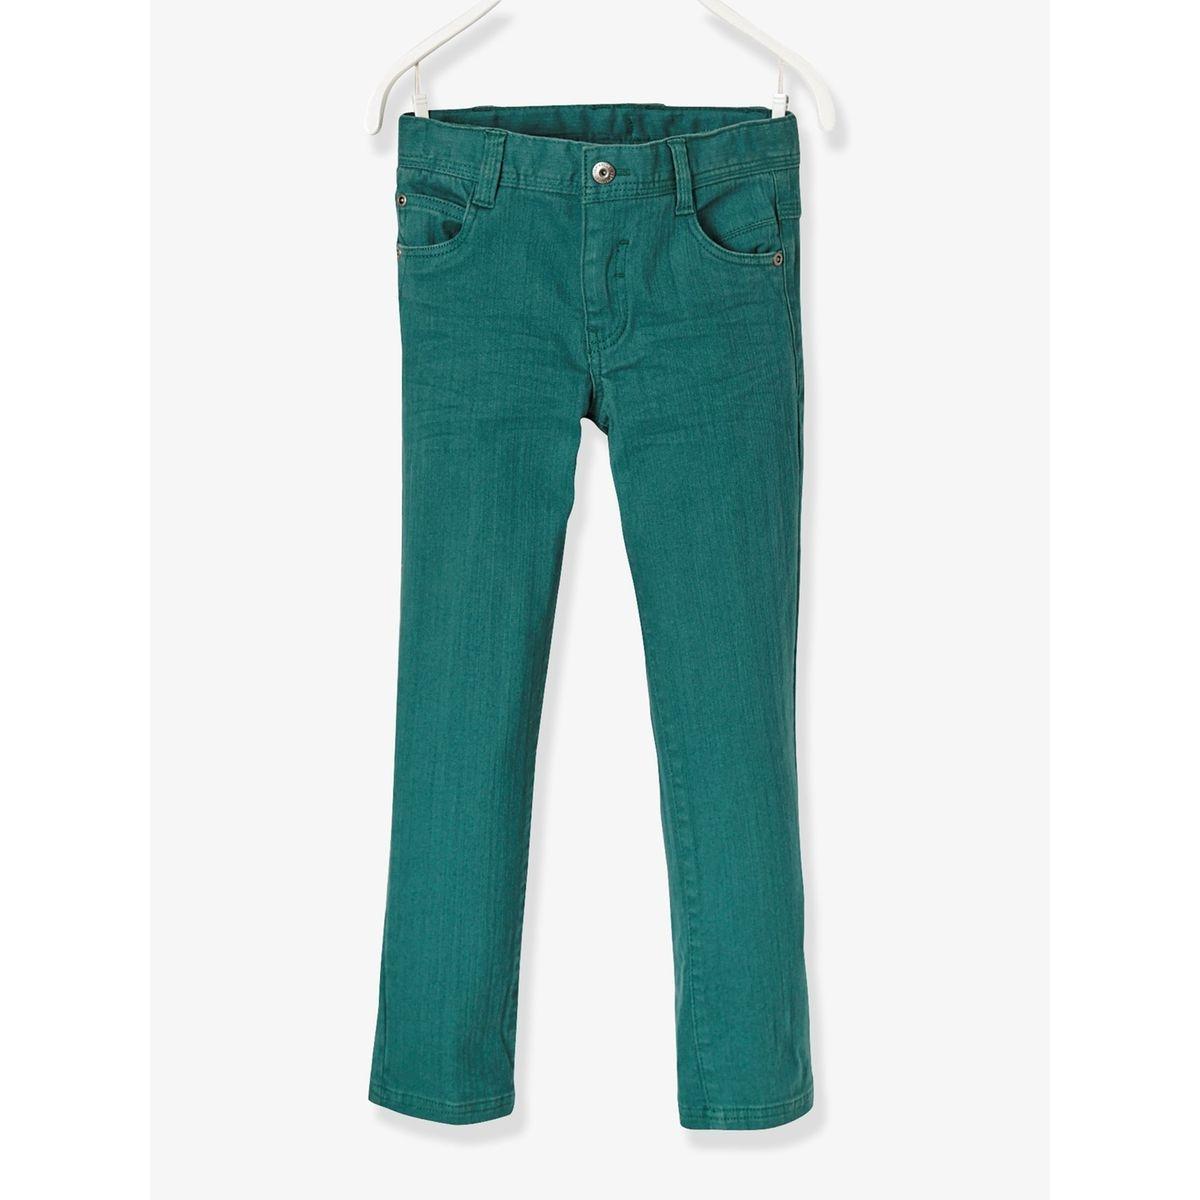 Pantalon slim garçon tour de hanches FIN morphologik